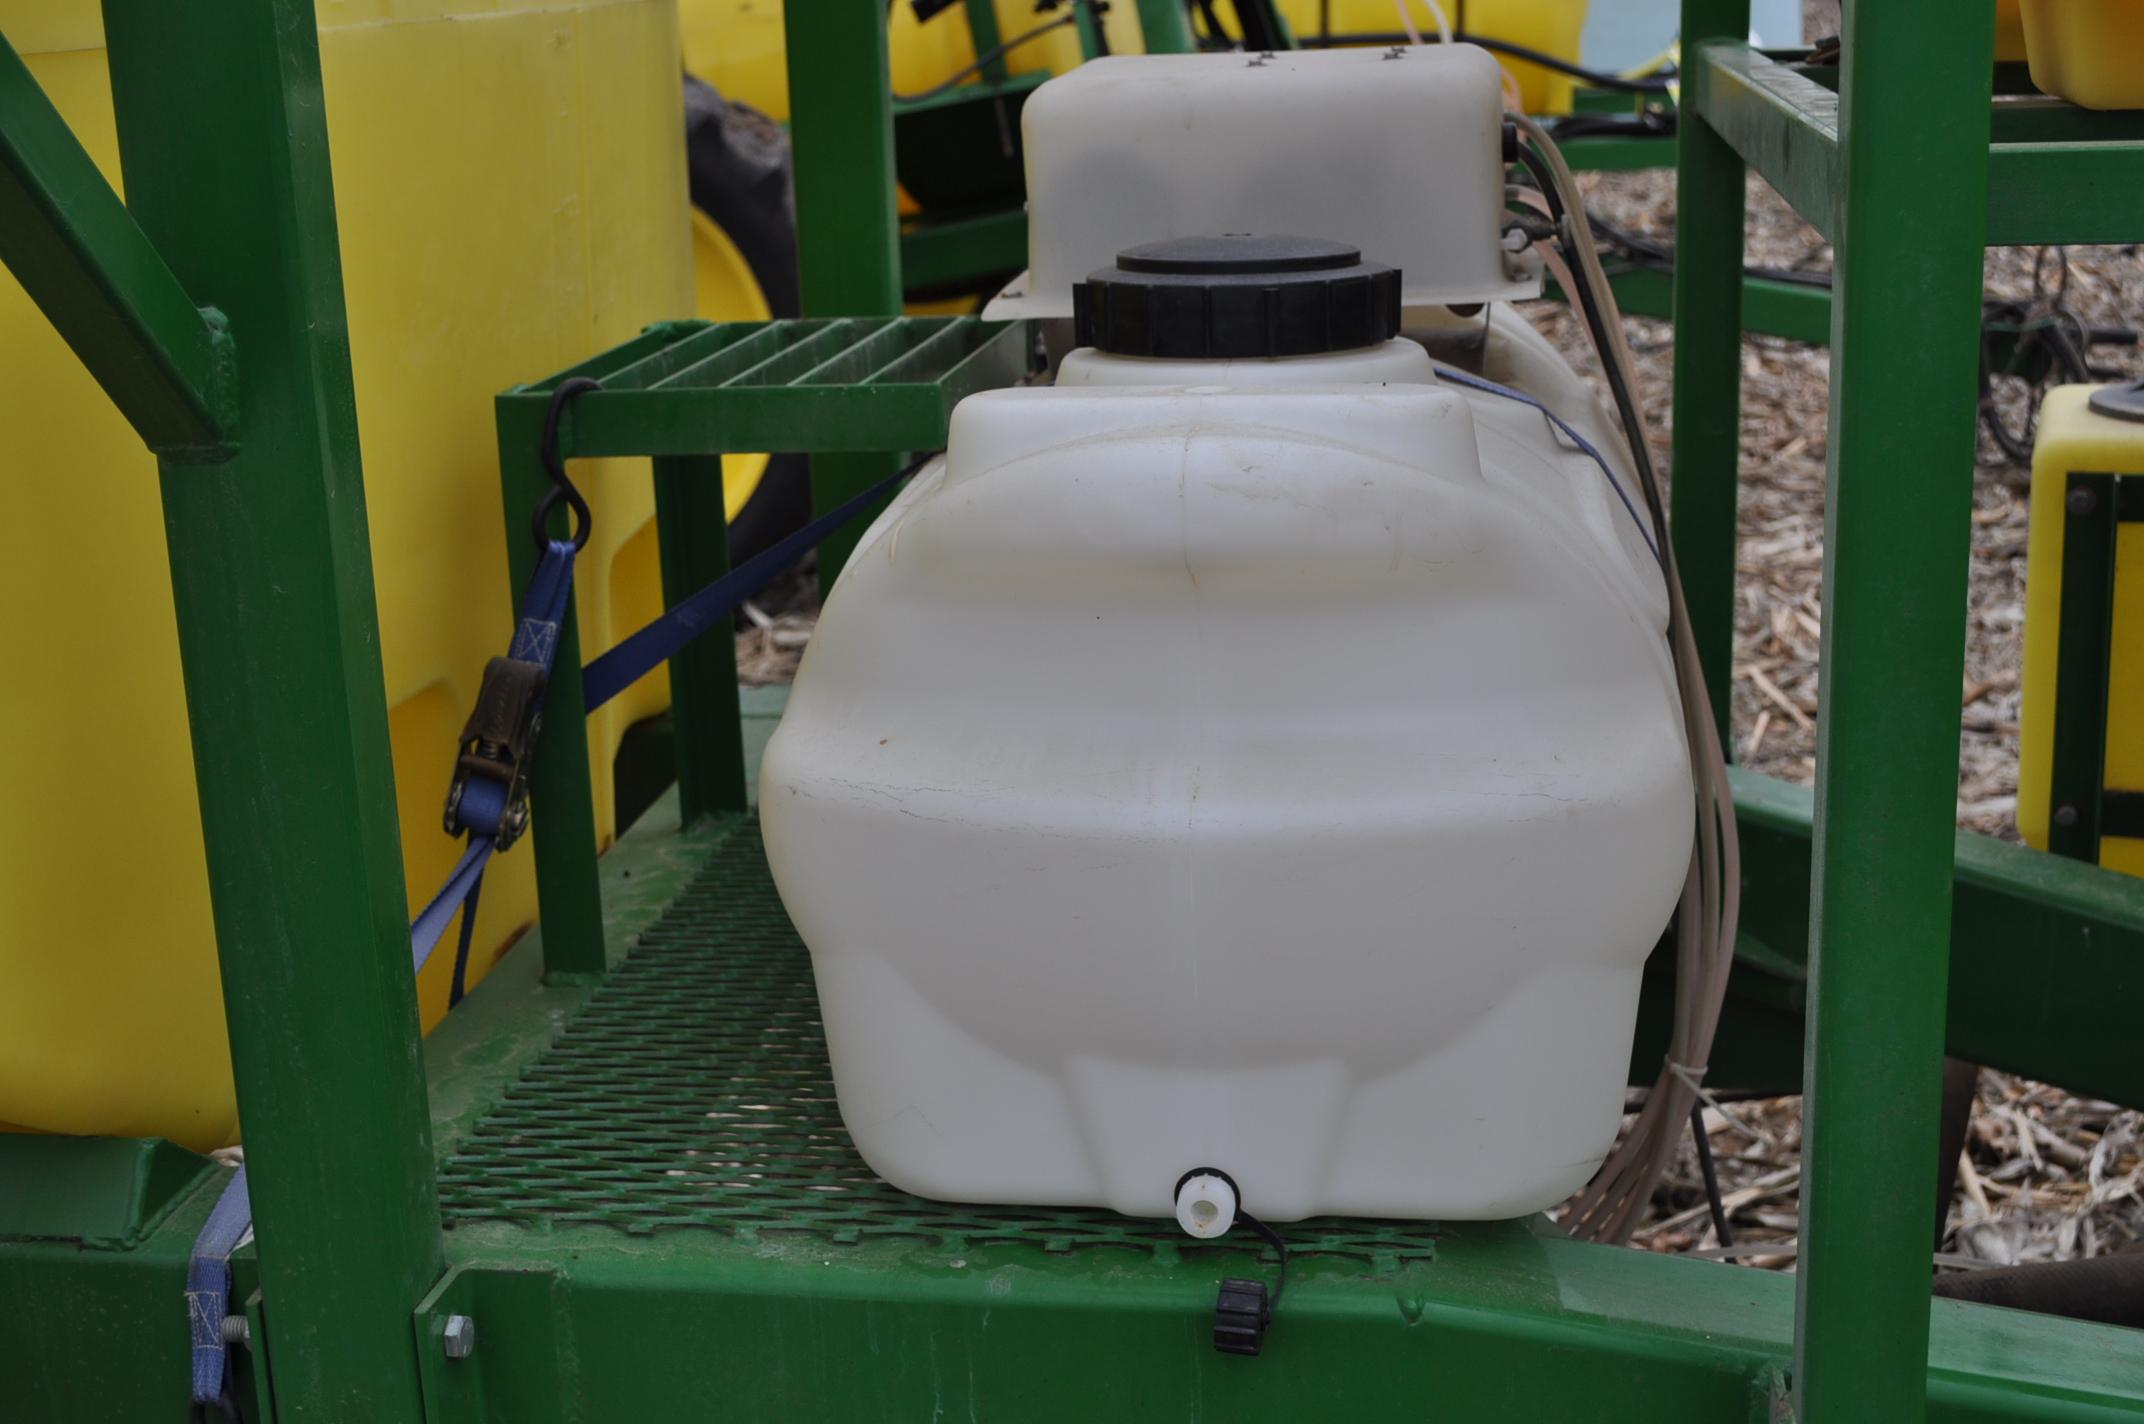 60' Spray King 1090 sprayer, 1000 gal poly tank, 100 gal rinse tank, foam marker, inductor, hyd - Image 20 of 21